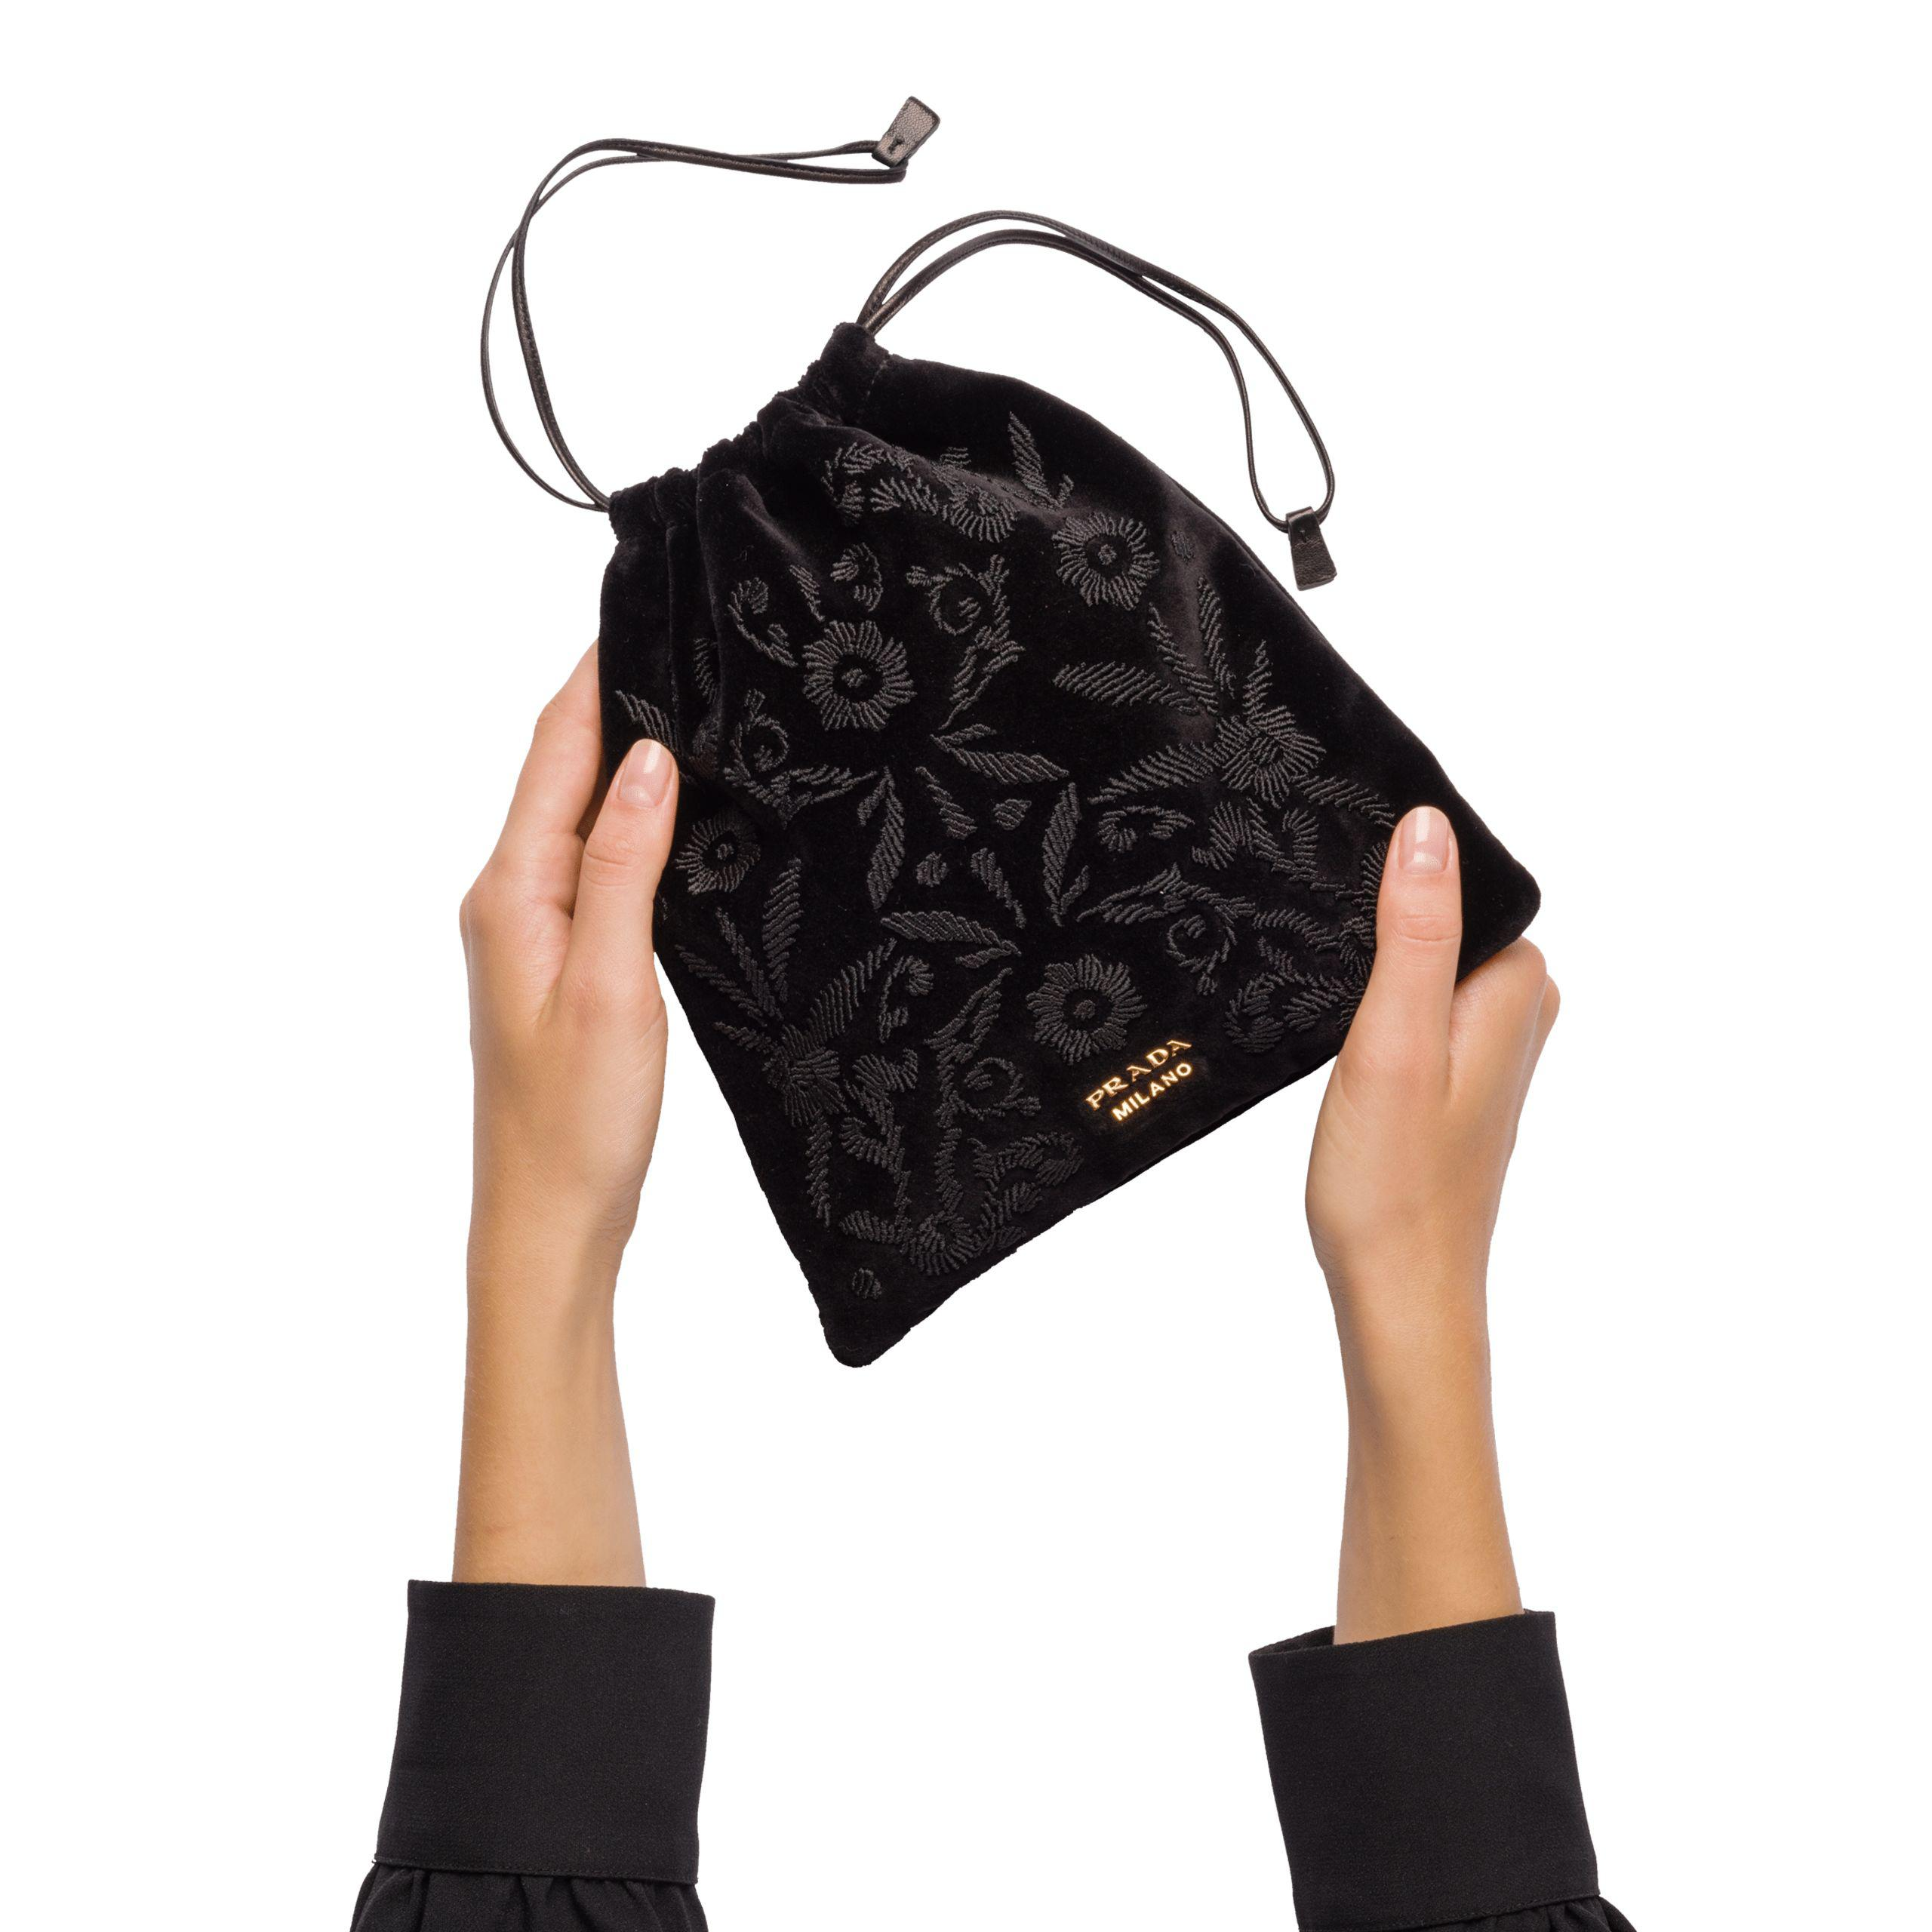 c5454c587c6f Lyst - Prada Embroidered Velvet Pouch in Black